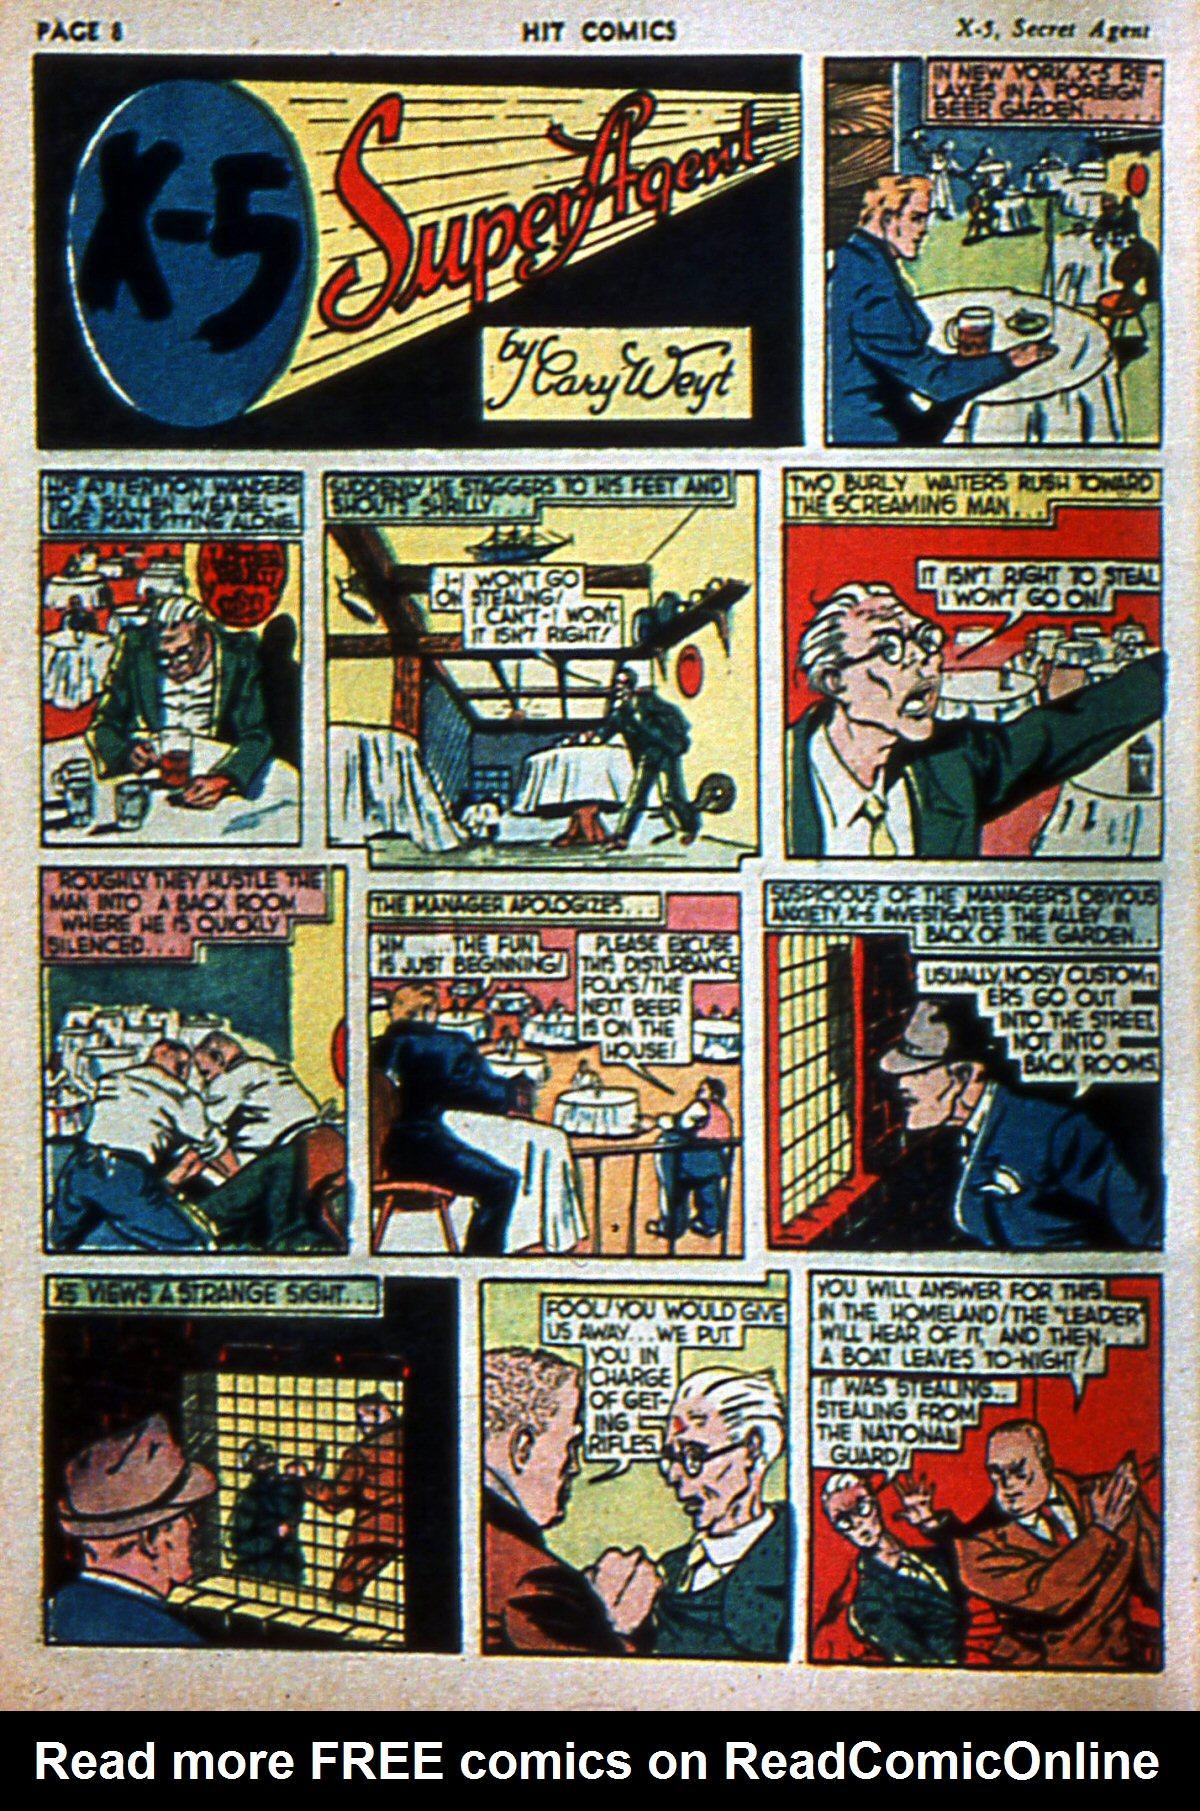 Read online Hit Comics comic -  Issue #3 - 10